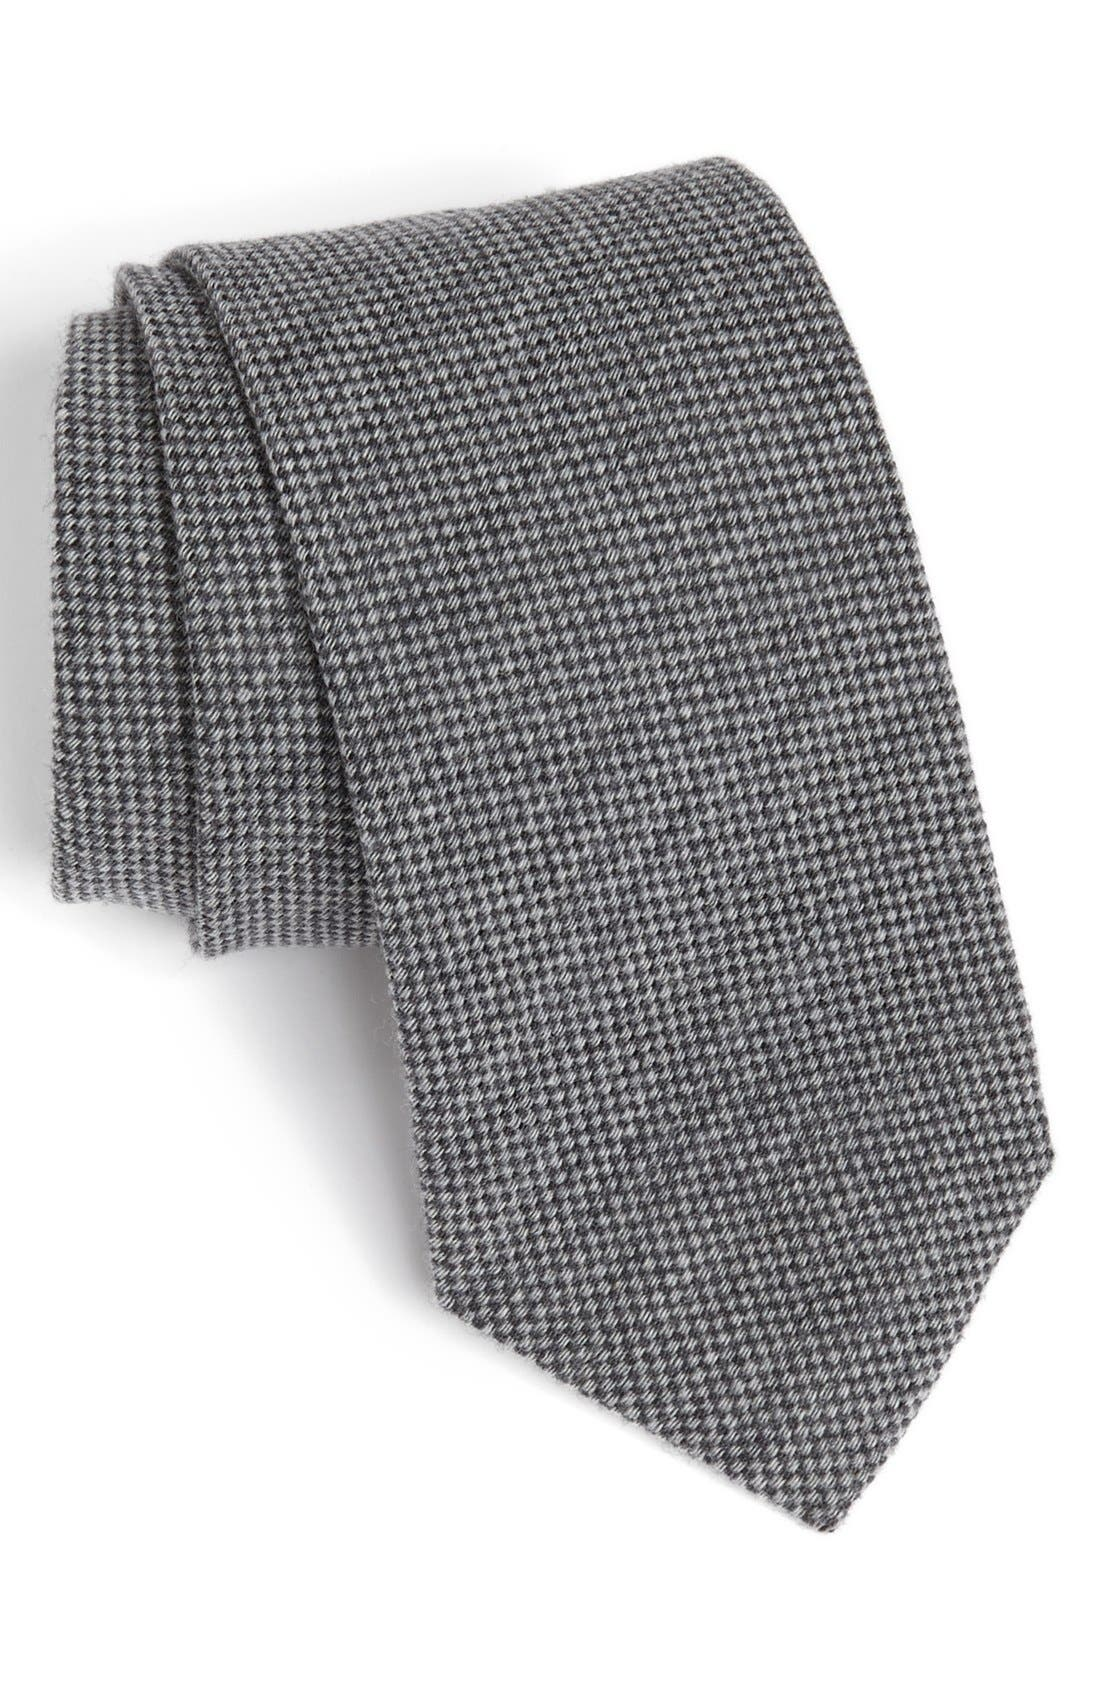 Alternate Image 1 Selected - John W. Nordstrom Woven Wool Tie